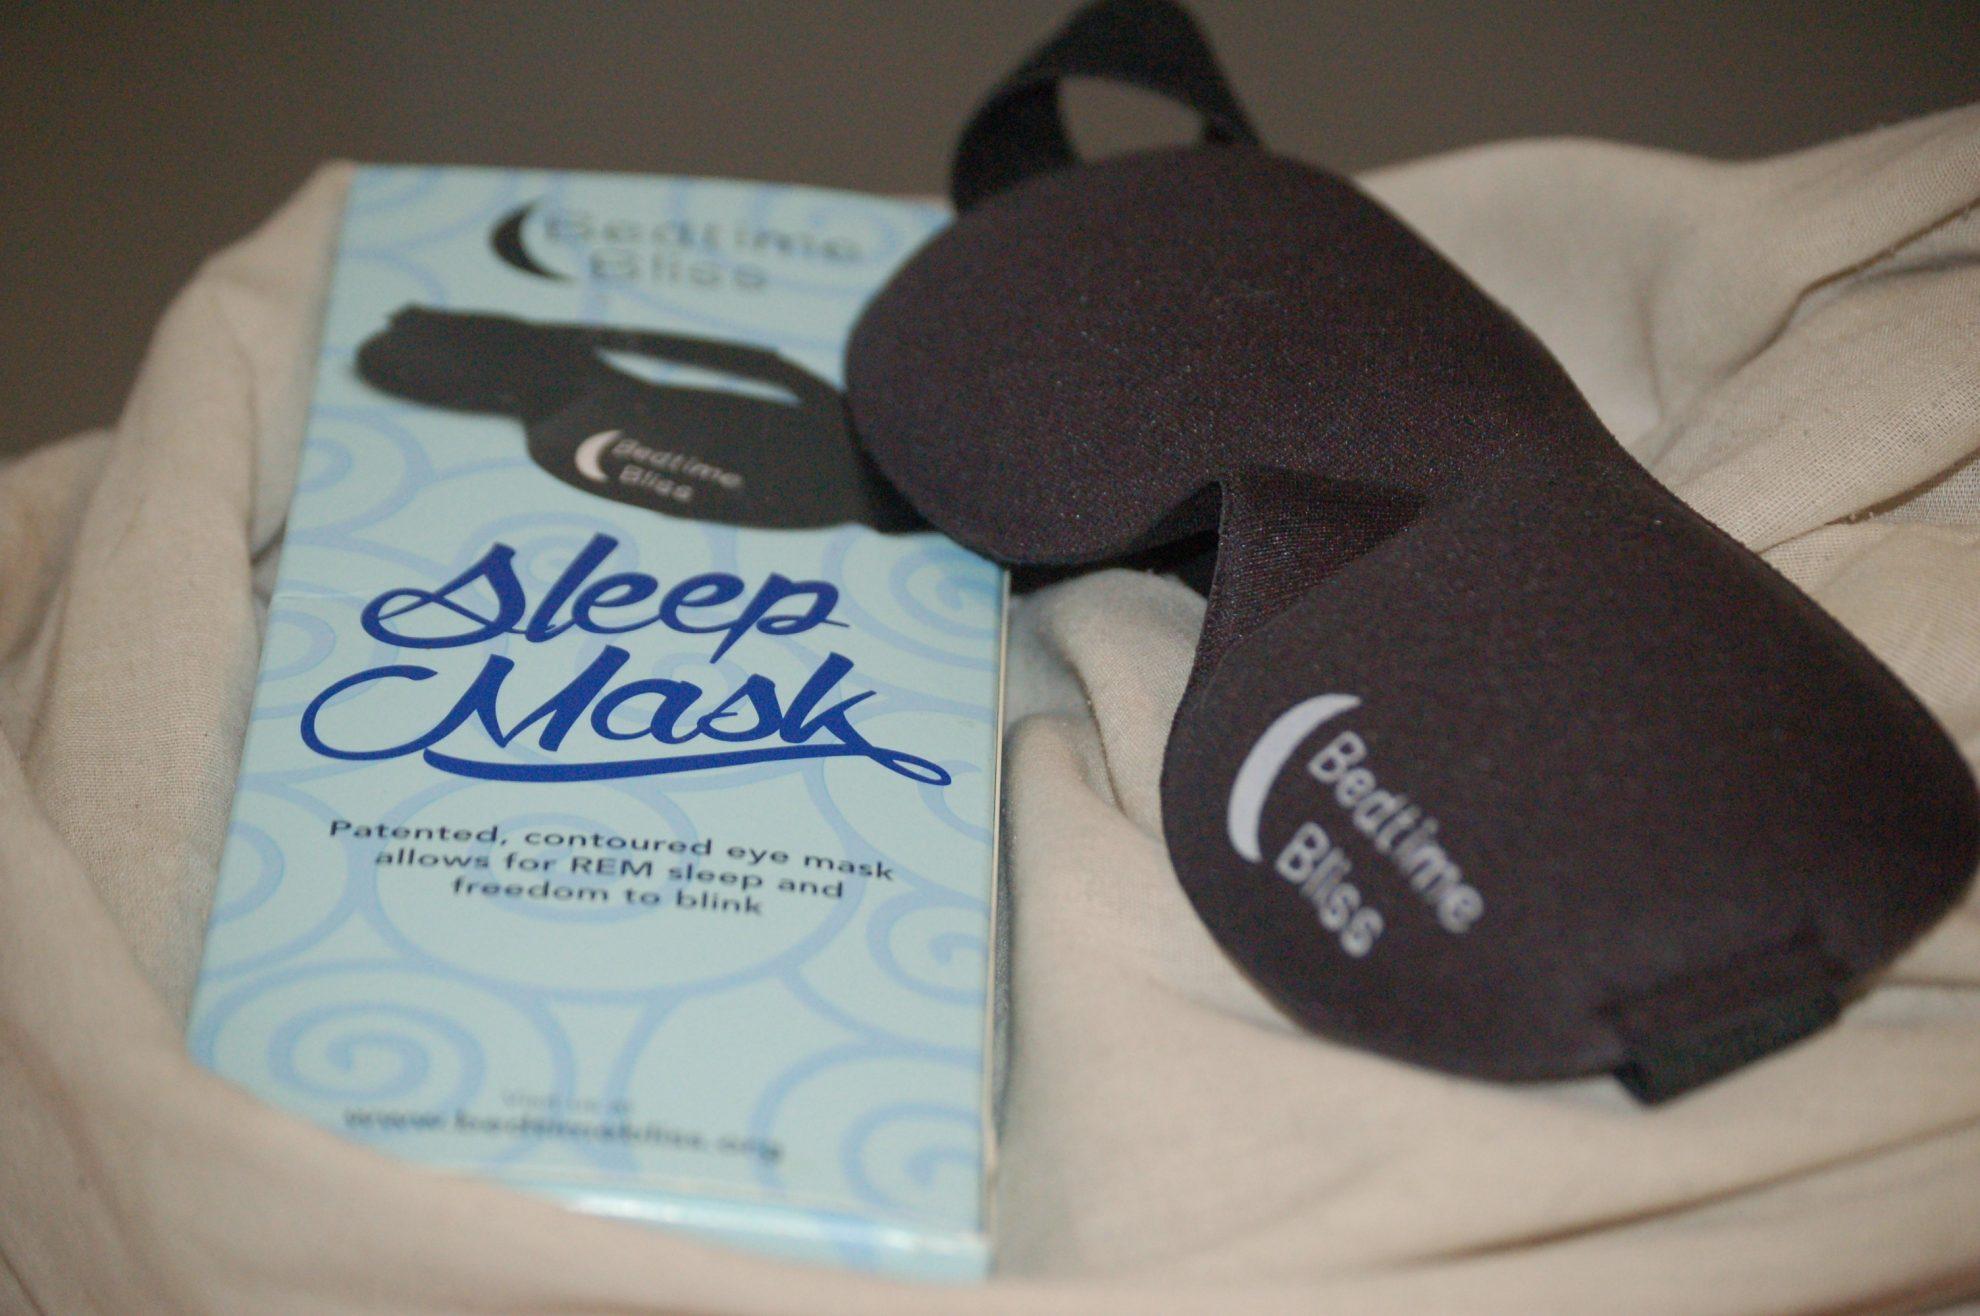 Bedtime Bliss Sleep Mask Review